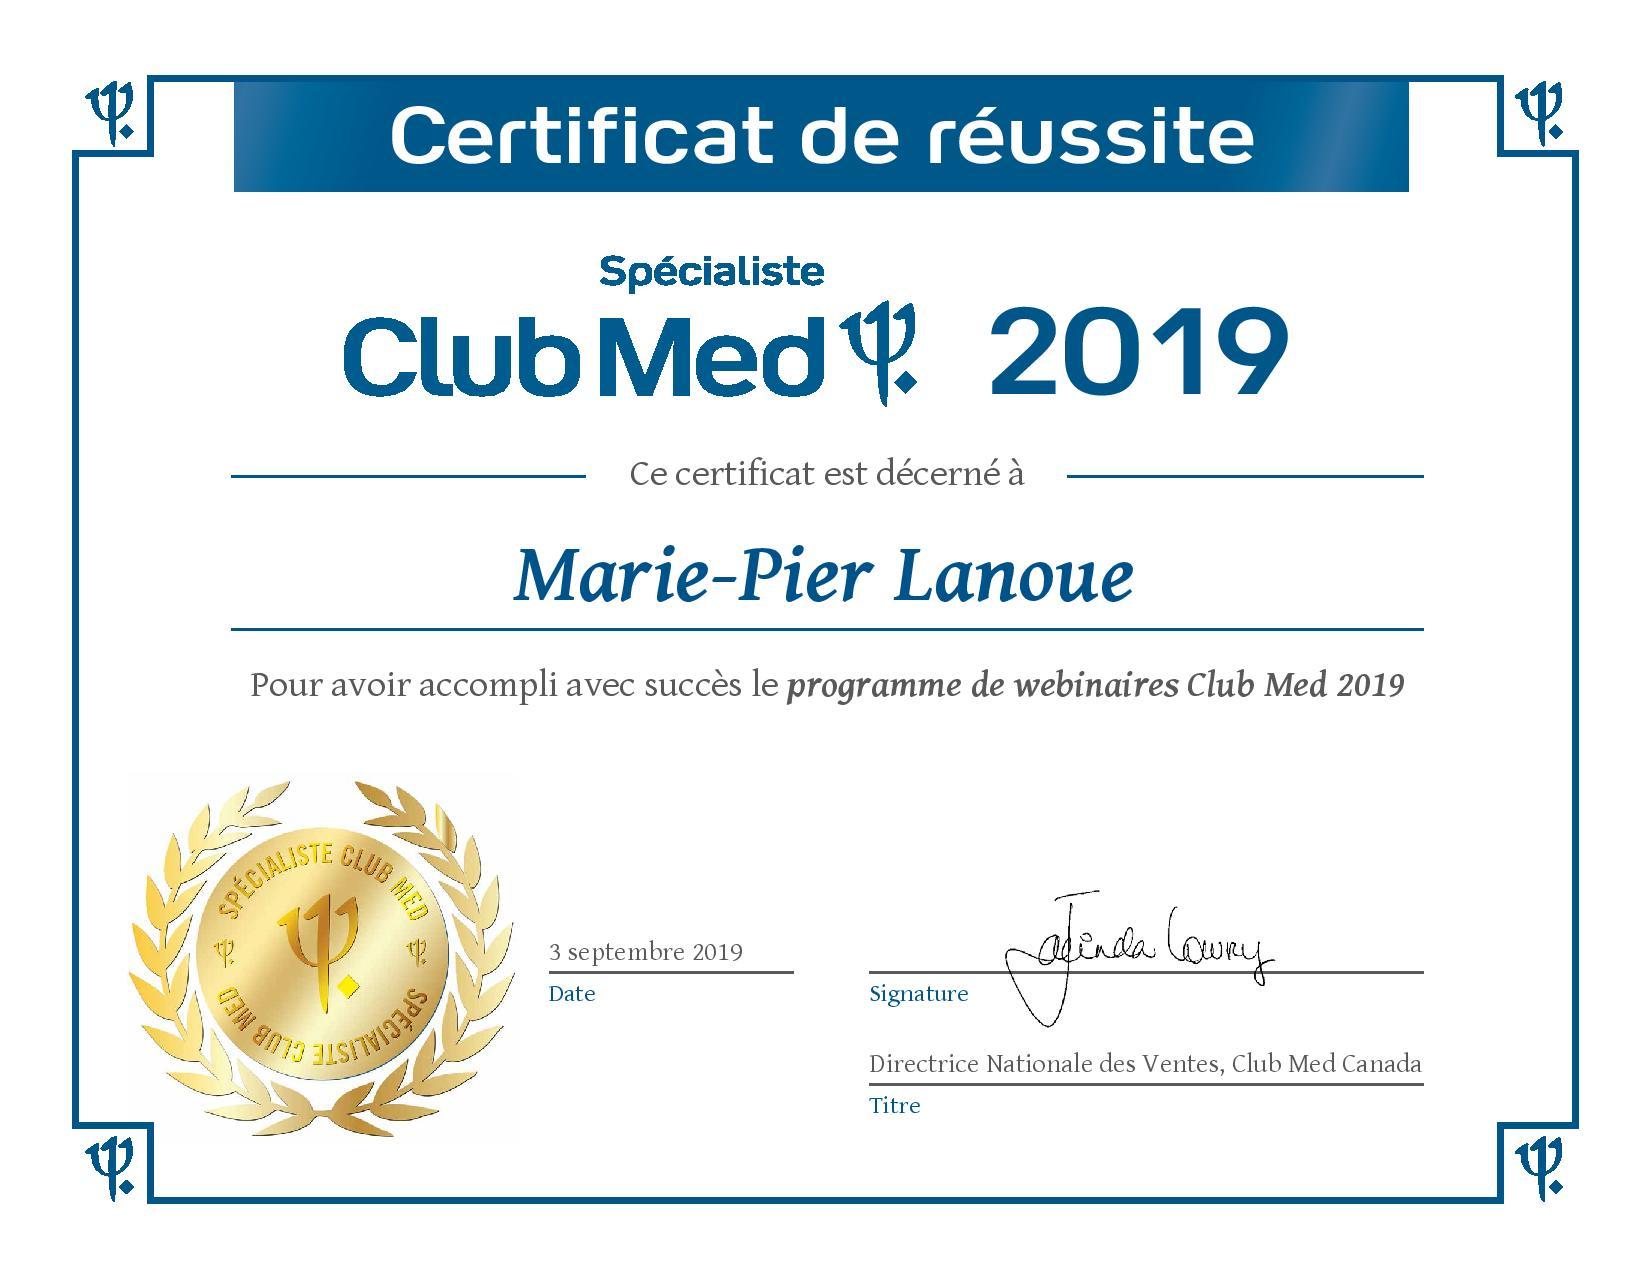 Club Med-page-001.jpg